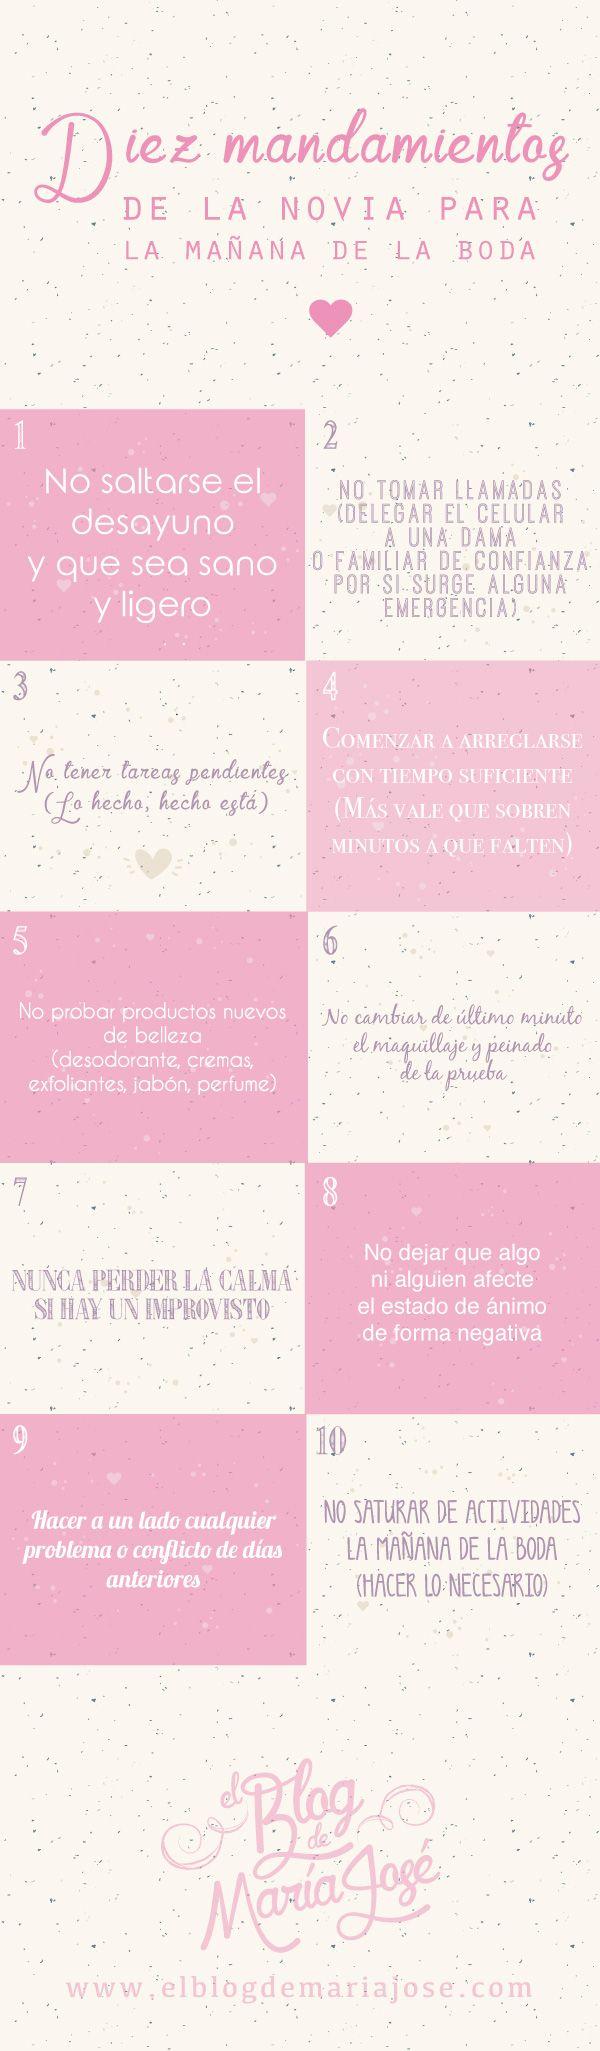 Diez mandamientos de la novia para la mañana de la boda | Mañana de ...